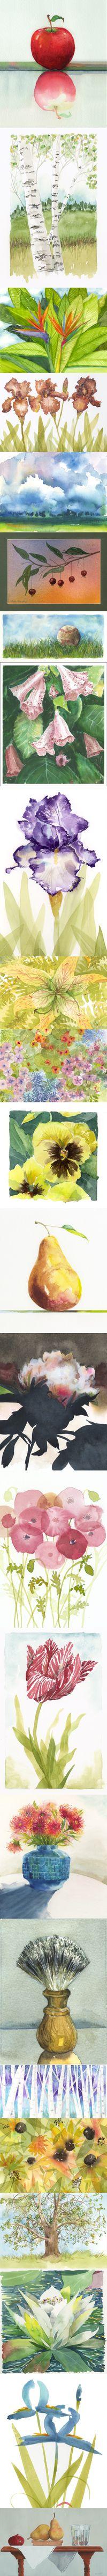 watercolors by jake marshall